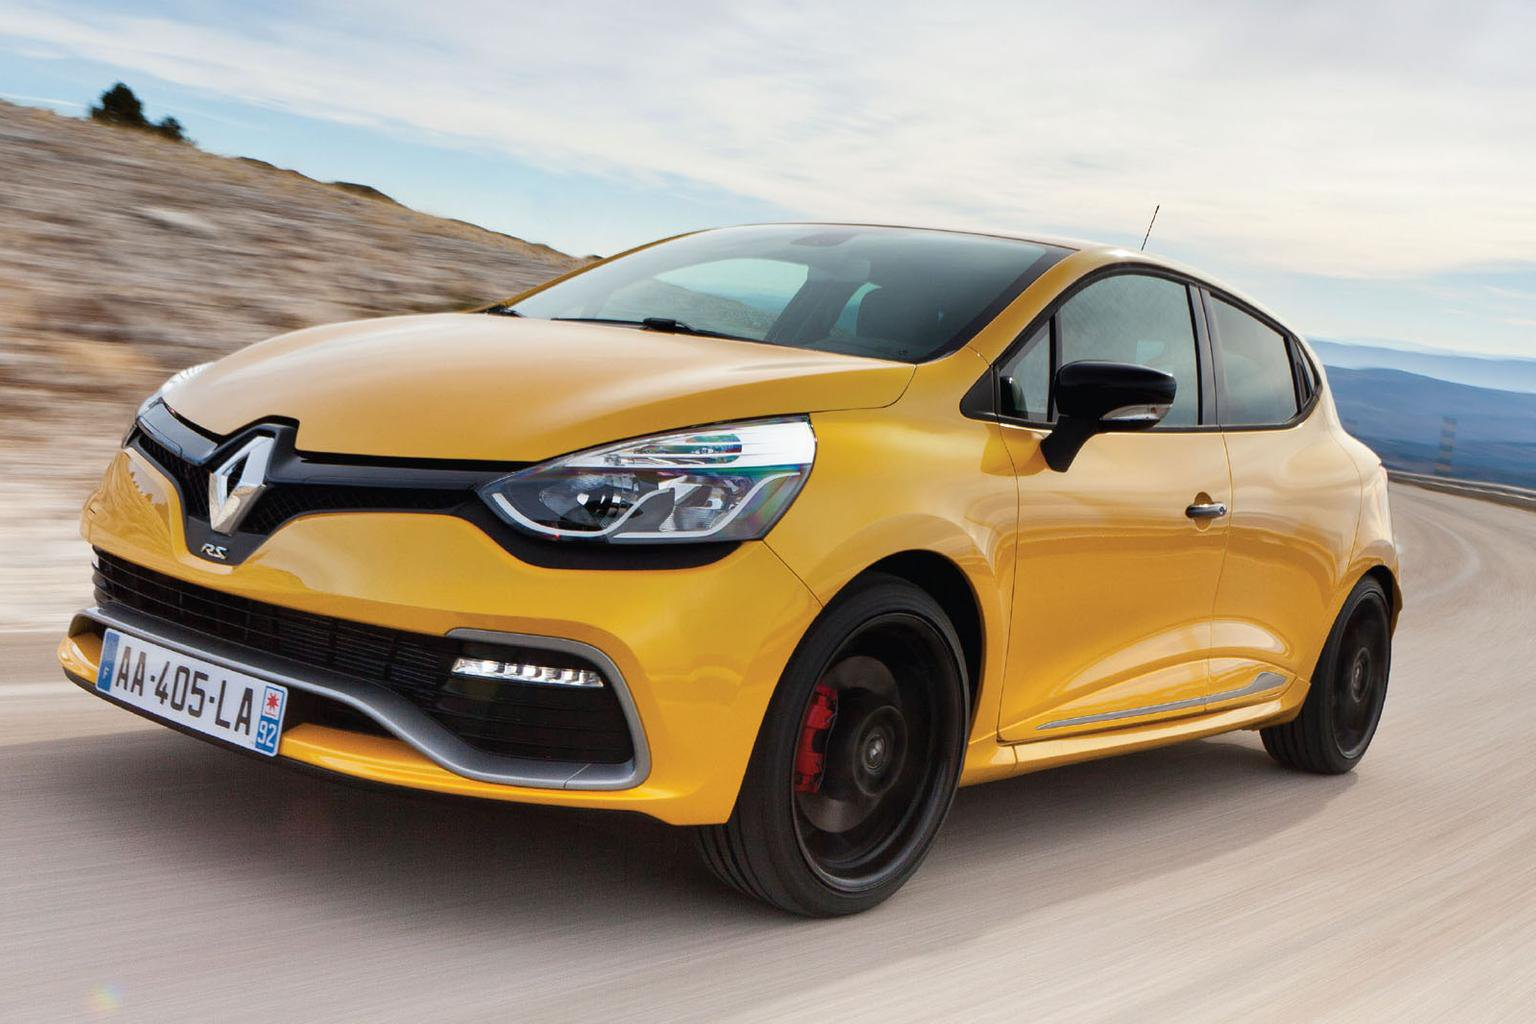 Hardcore Renaultsport Clio may happen